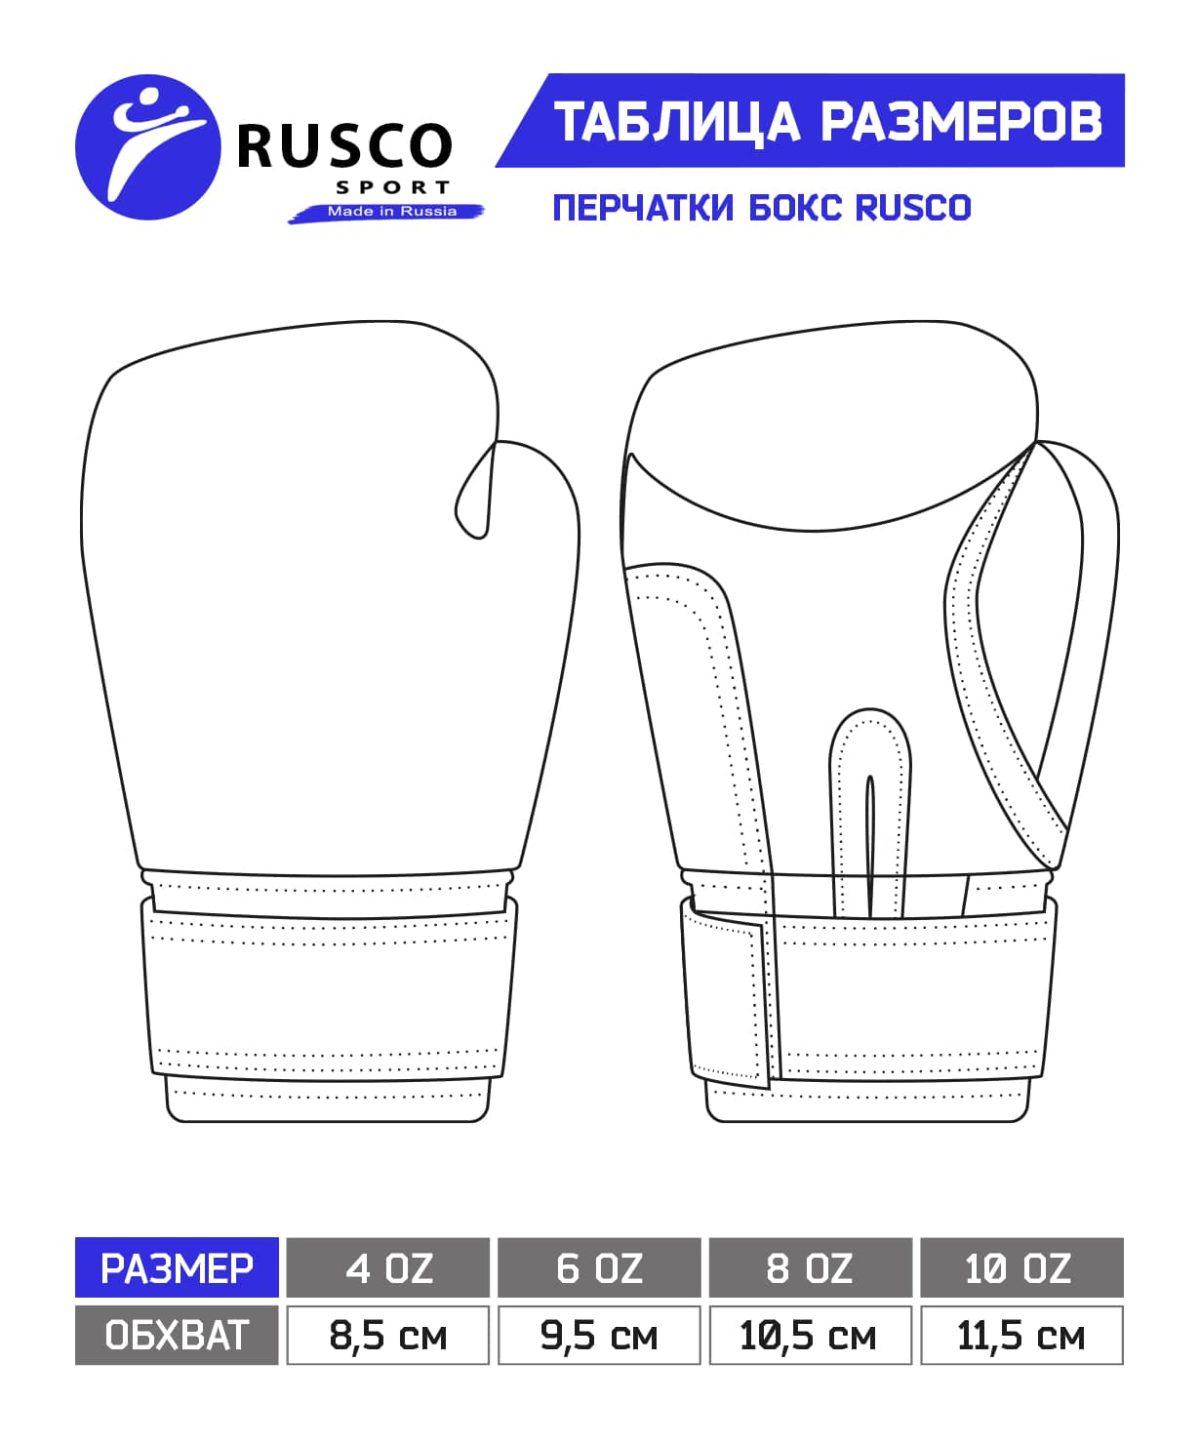 RUSCO Перчатки бокс. 10oz, к/з  18530 - 6